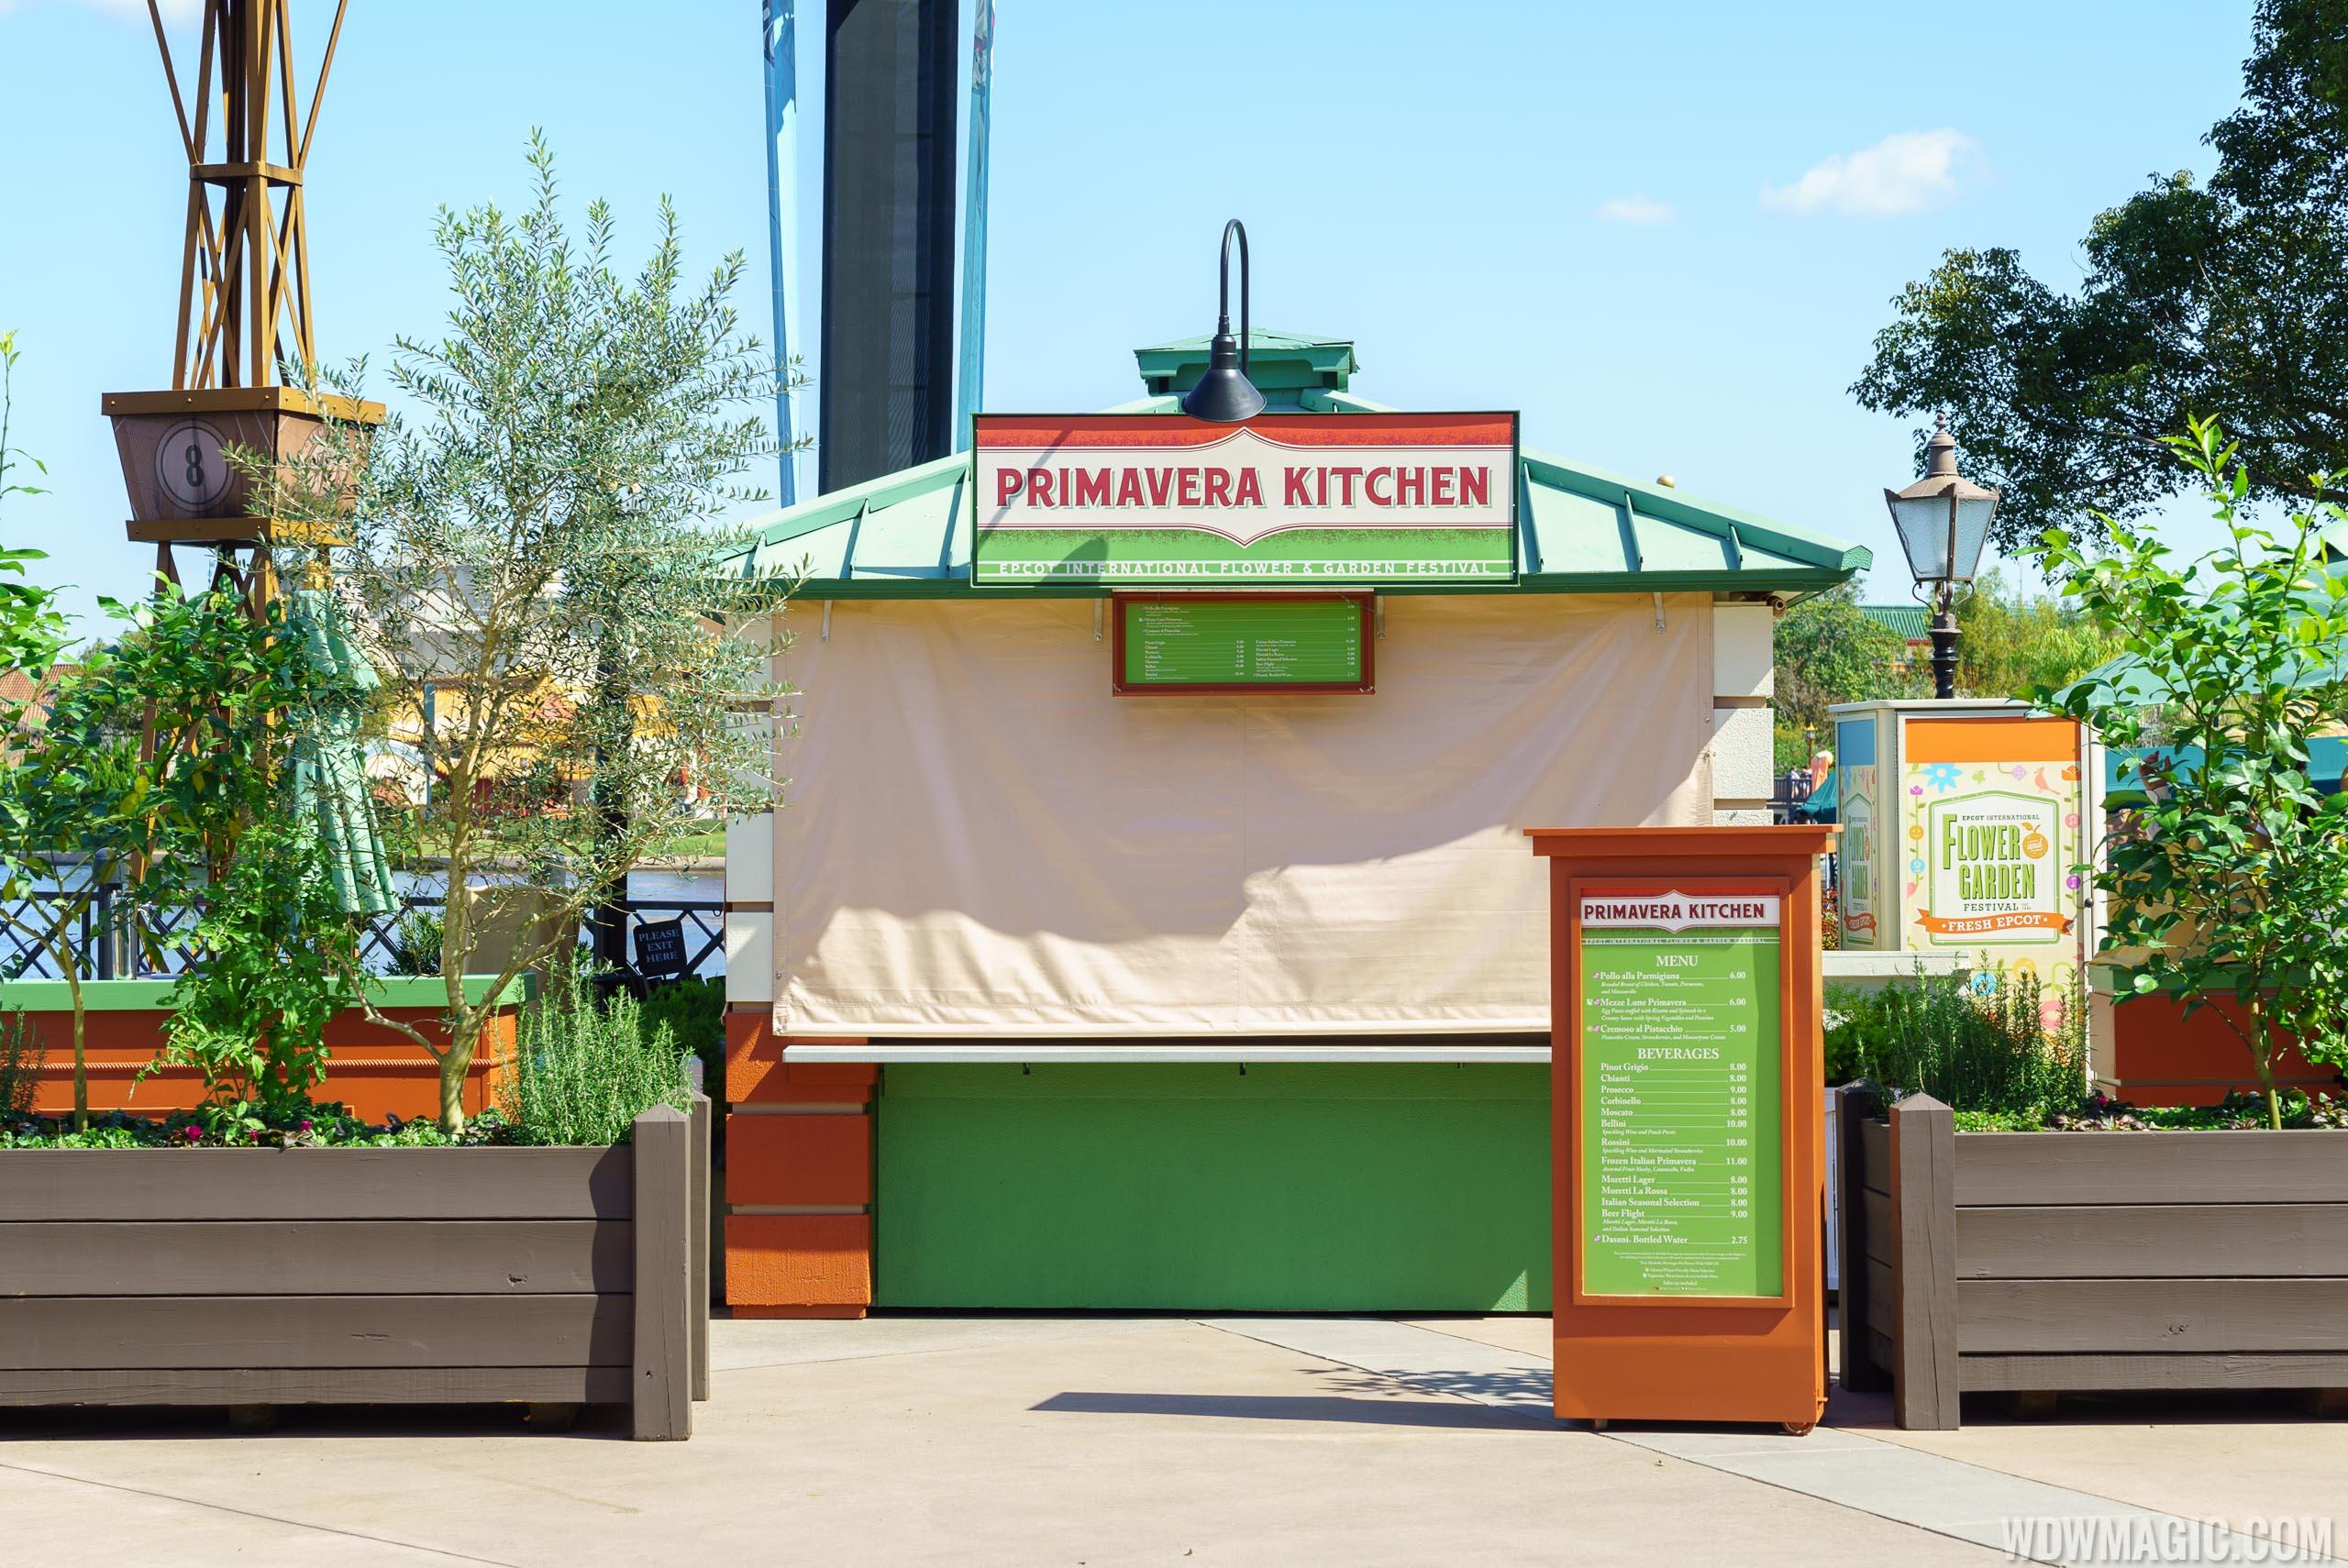 Primavera Kitchen overview